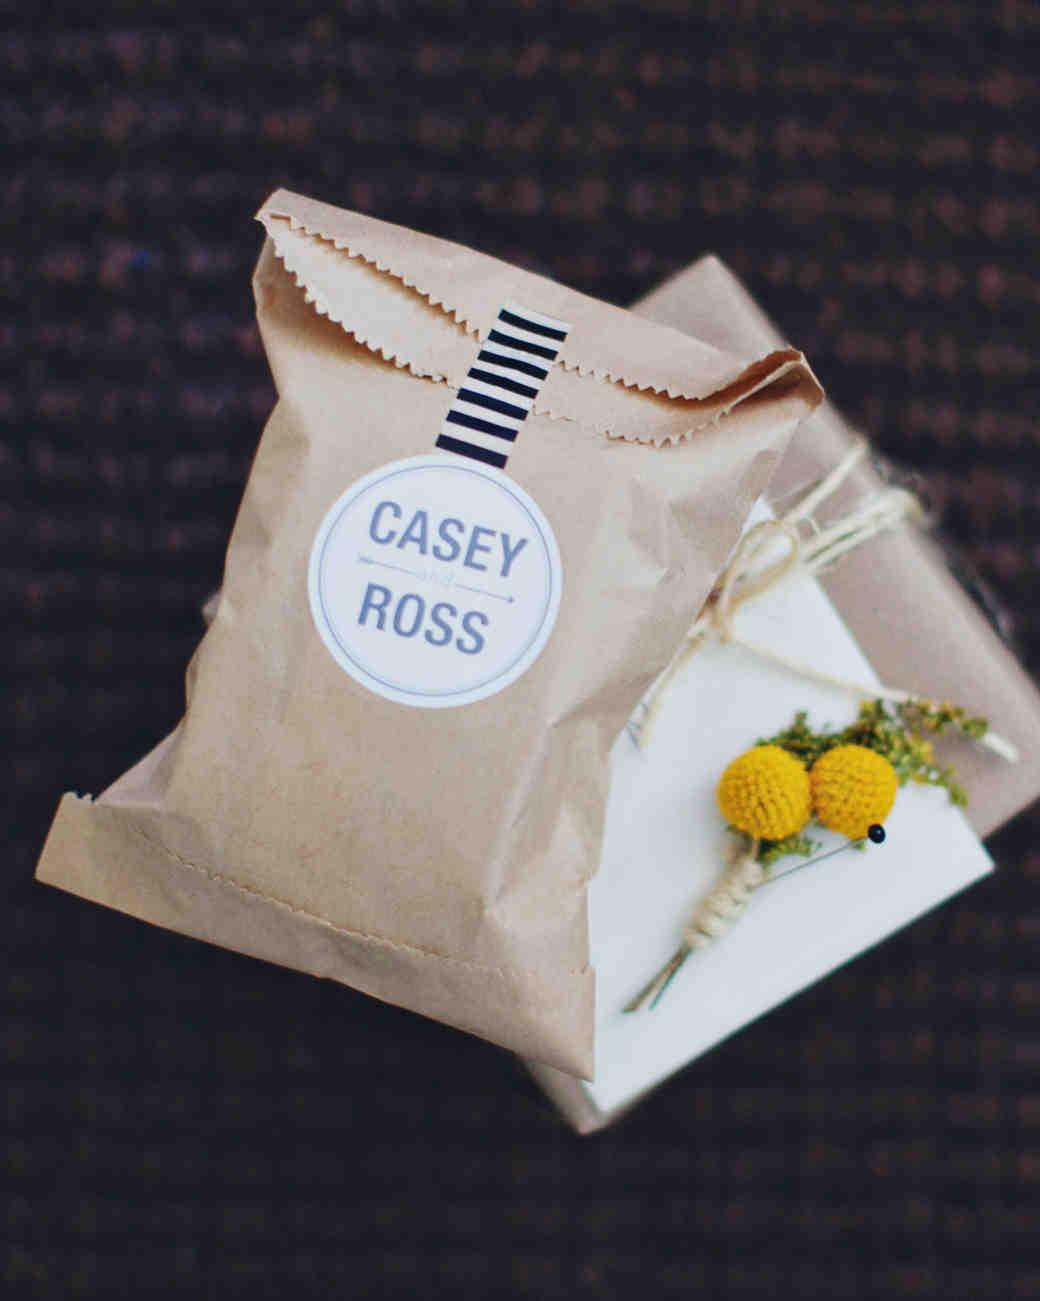 casey-ross-wedding-gifts-205-s111514-1114.jpg